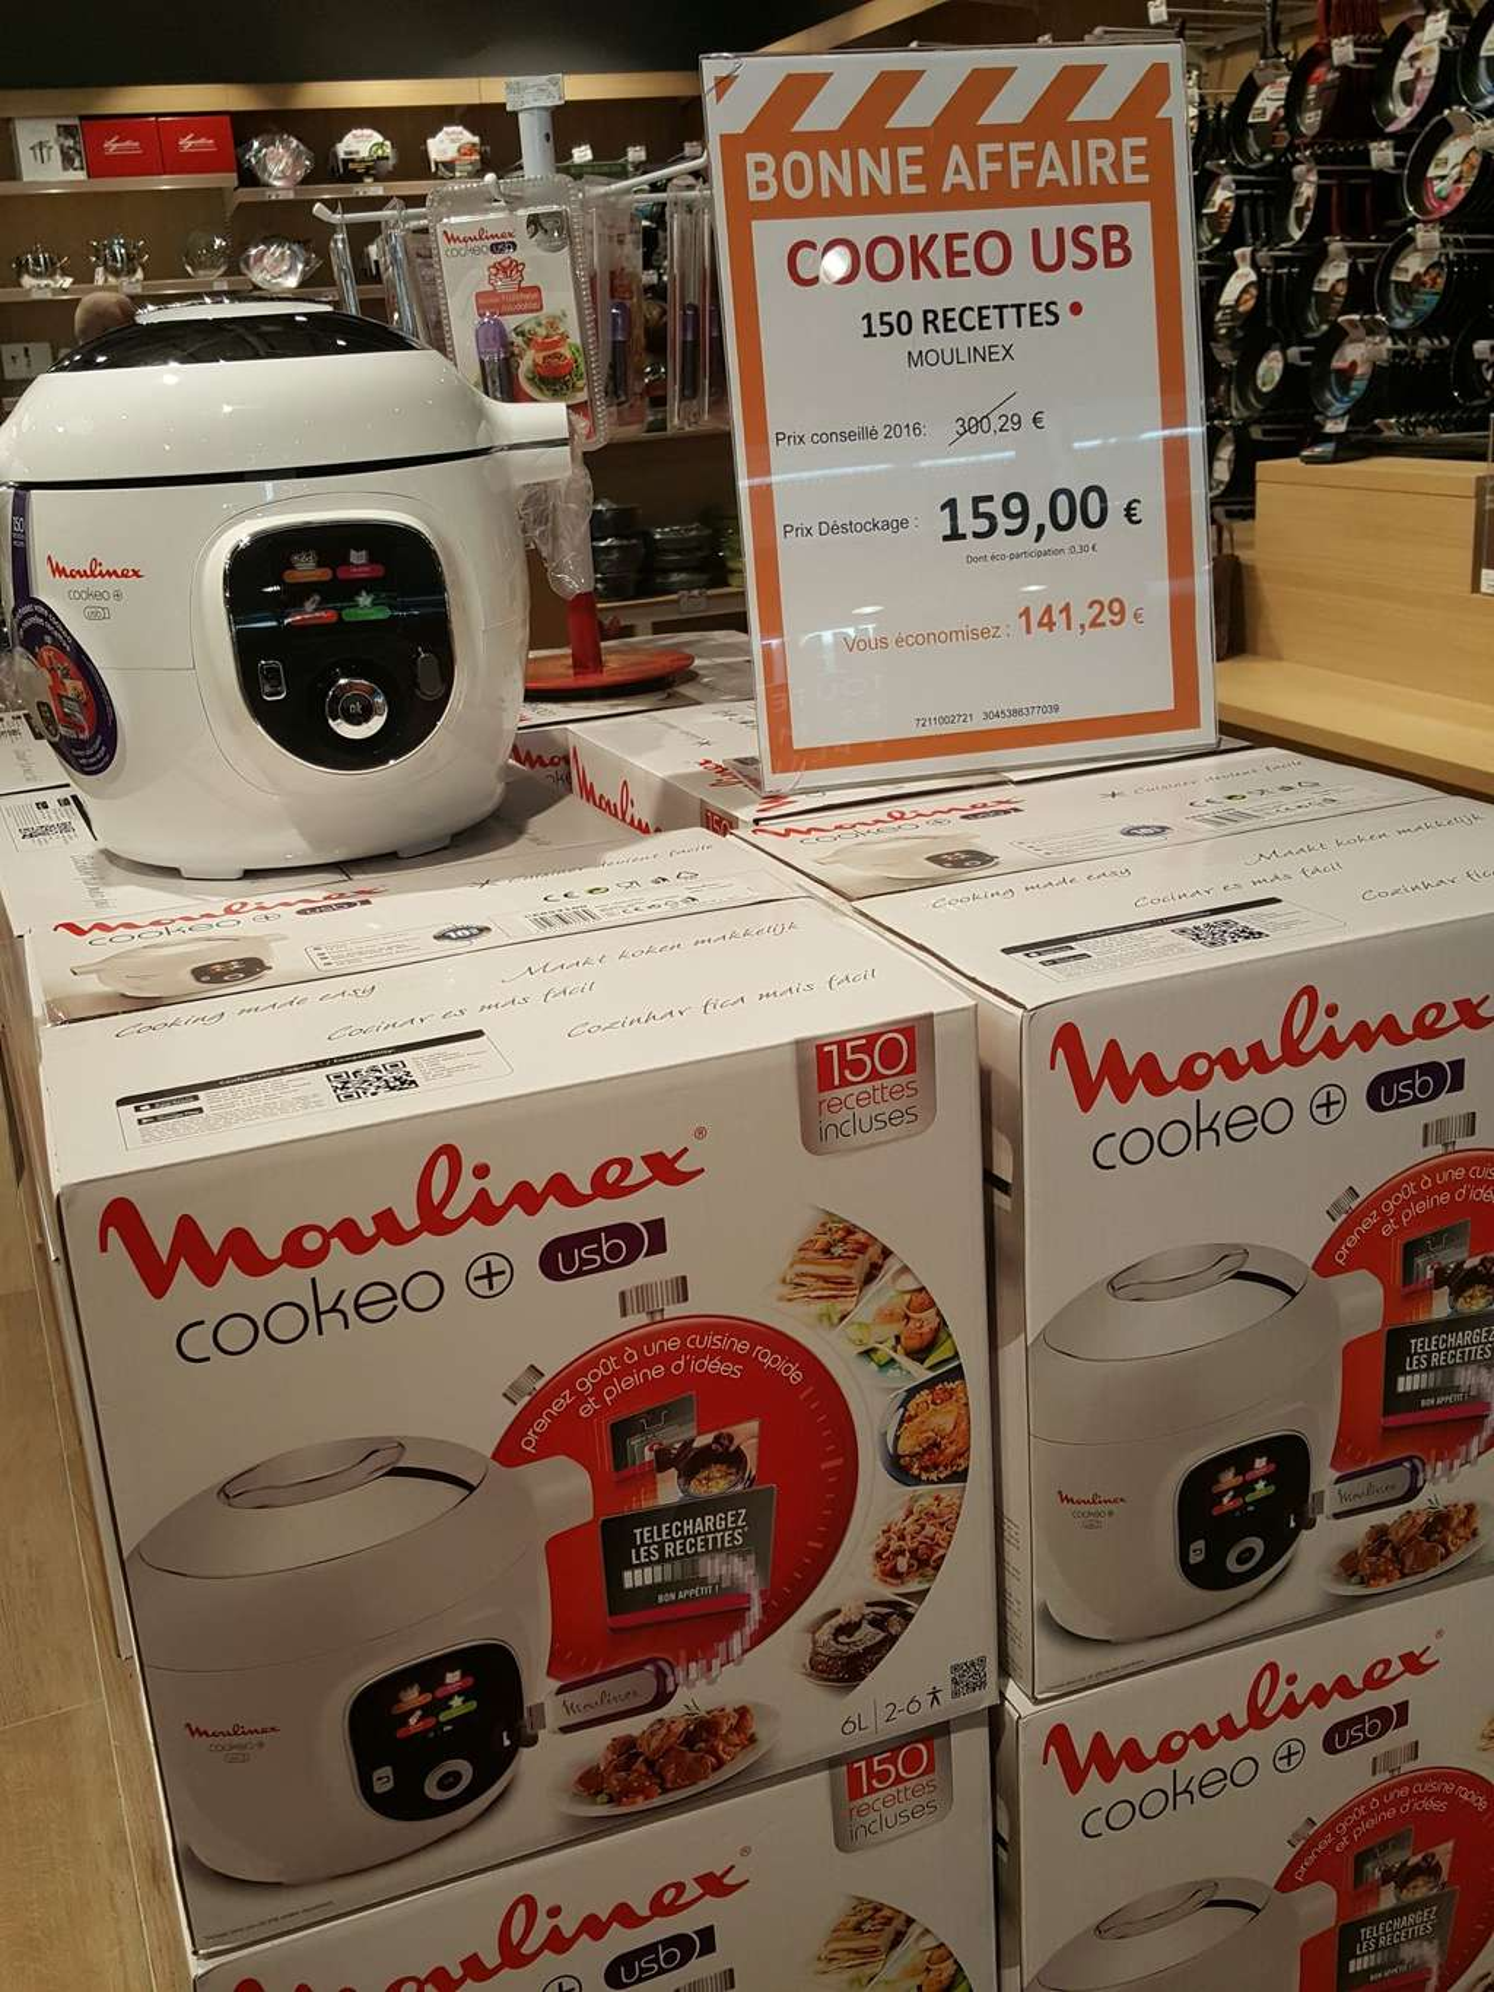 multicuiseur intelligent moulinex cookeo usb ce853100 1600w 150 recettes home cook. Black Bedroom Furniture Sets. Home Design Ideas